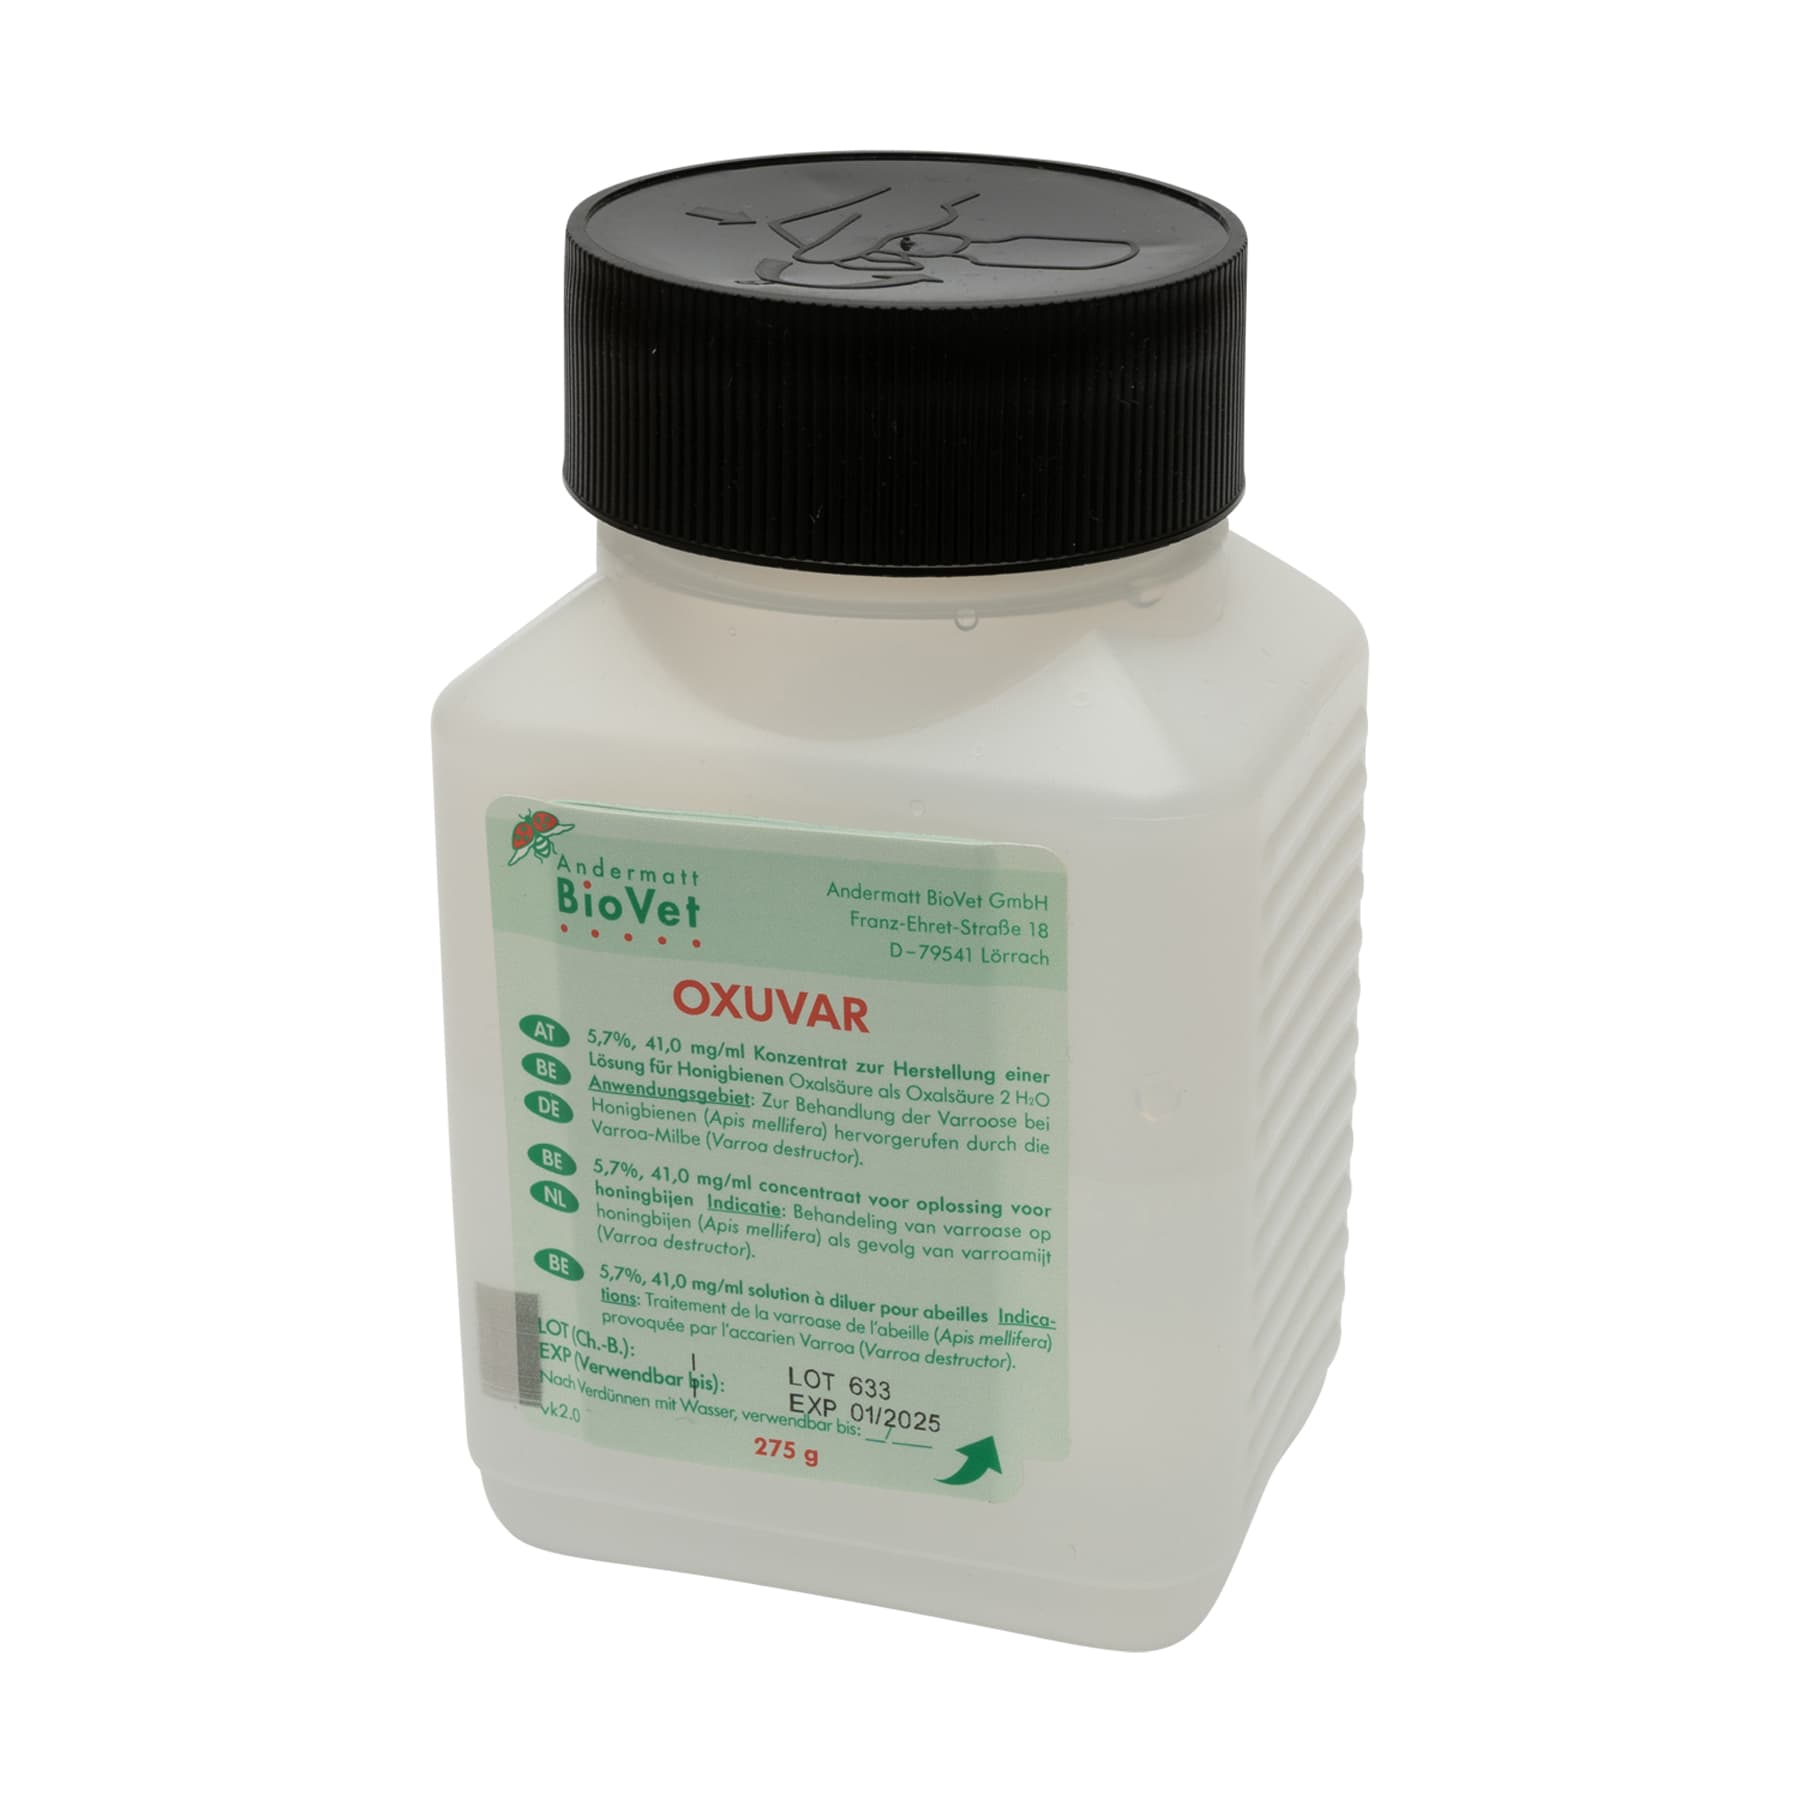 OXUVAR® 5,7%,  275  g 1 Produkt 2 Anwendungen (Wirkstoff Oxalsäure)